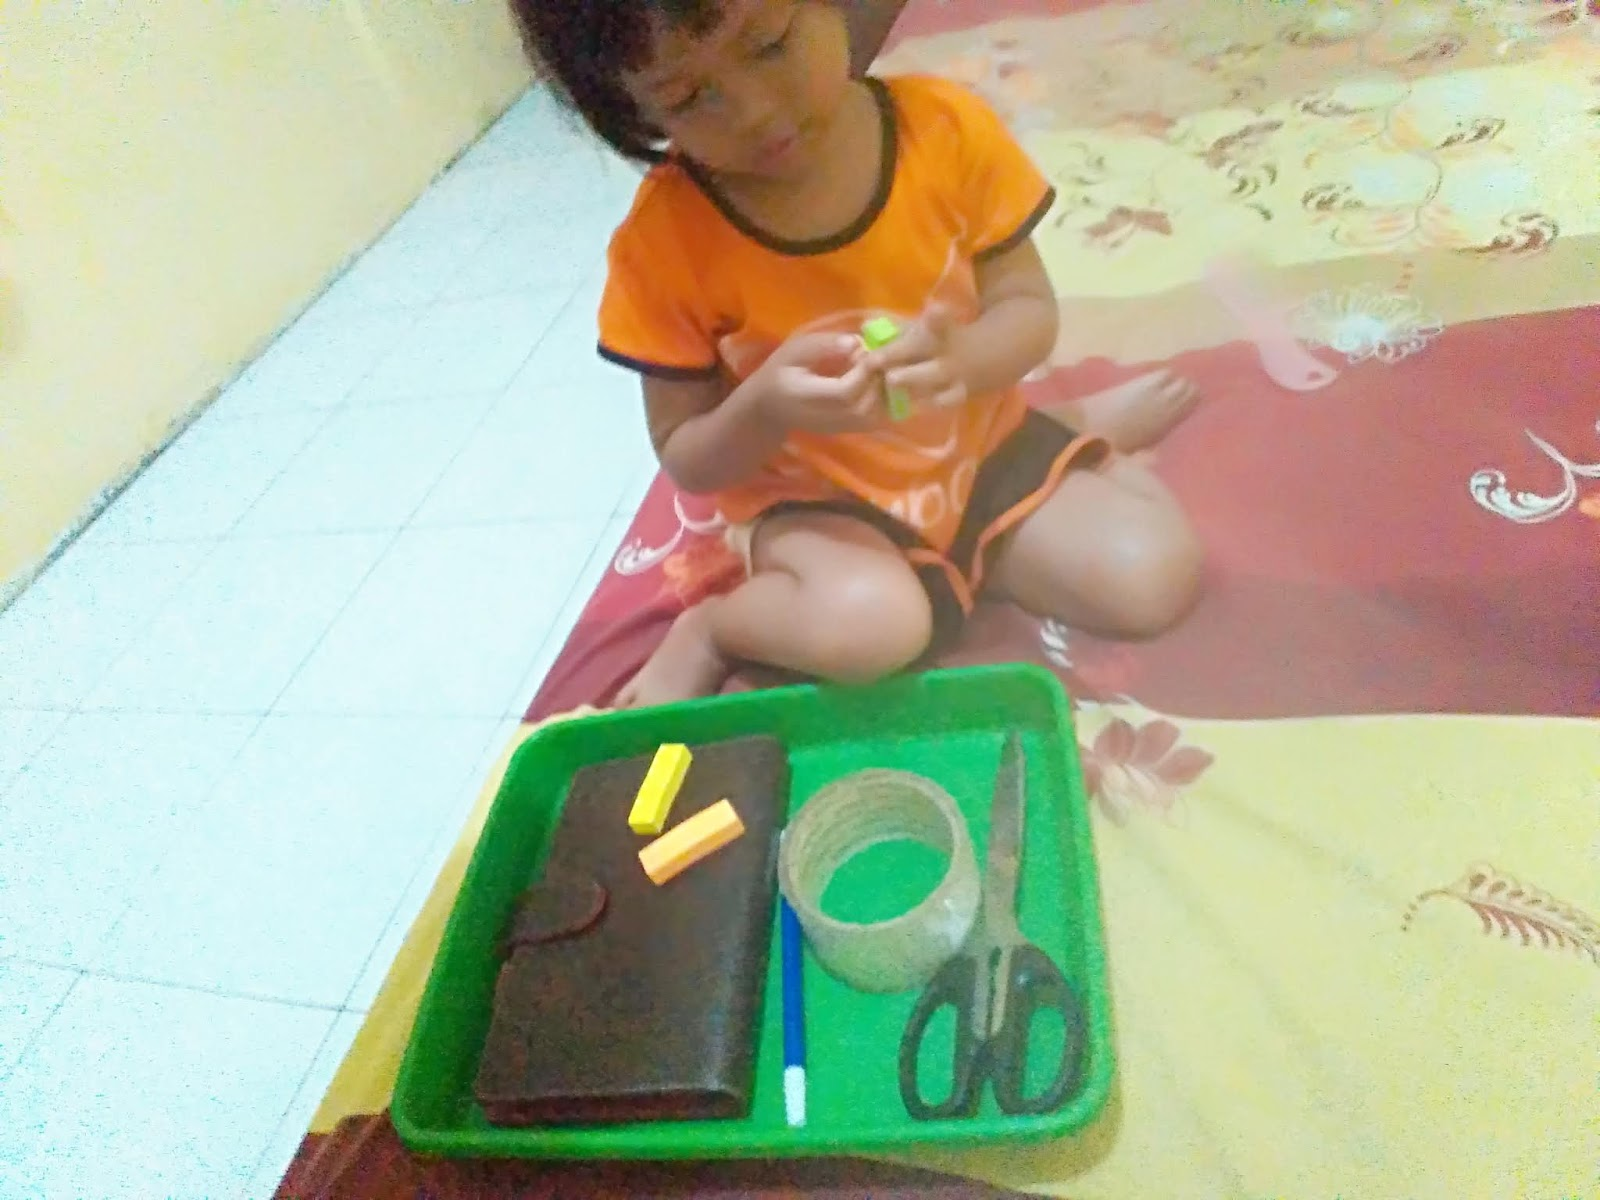 Hatékony gyógyszer a gyermekek pinwormsjeire